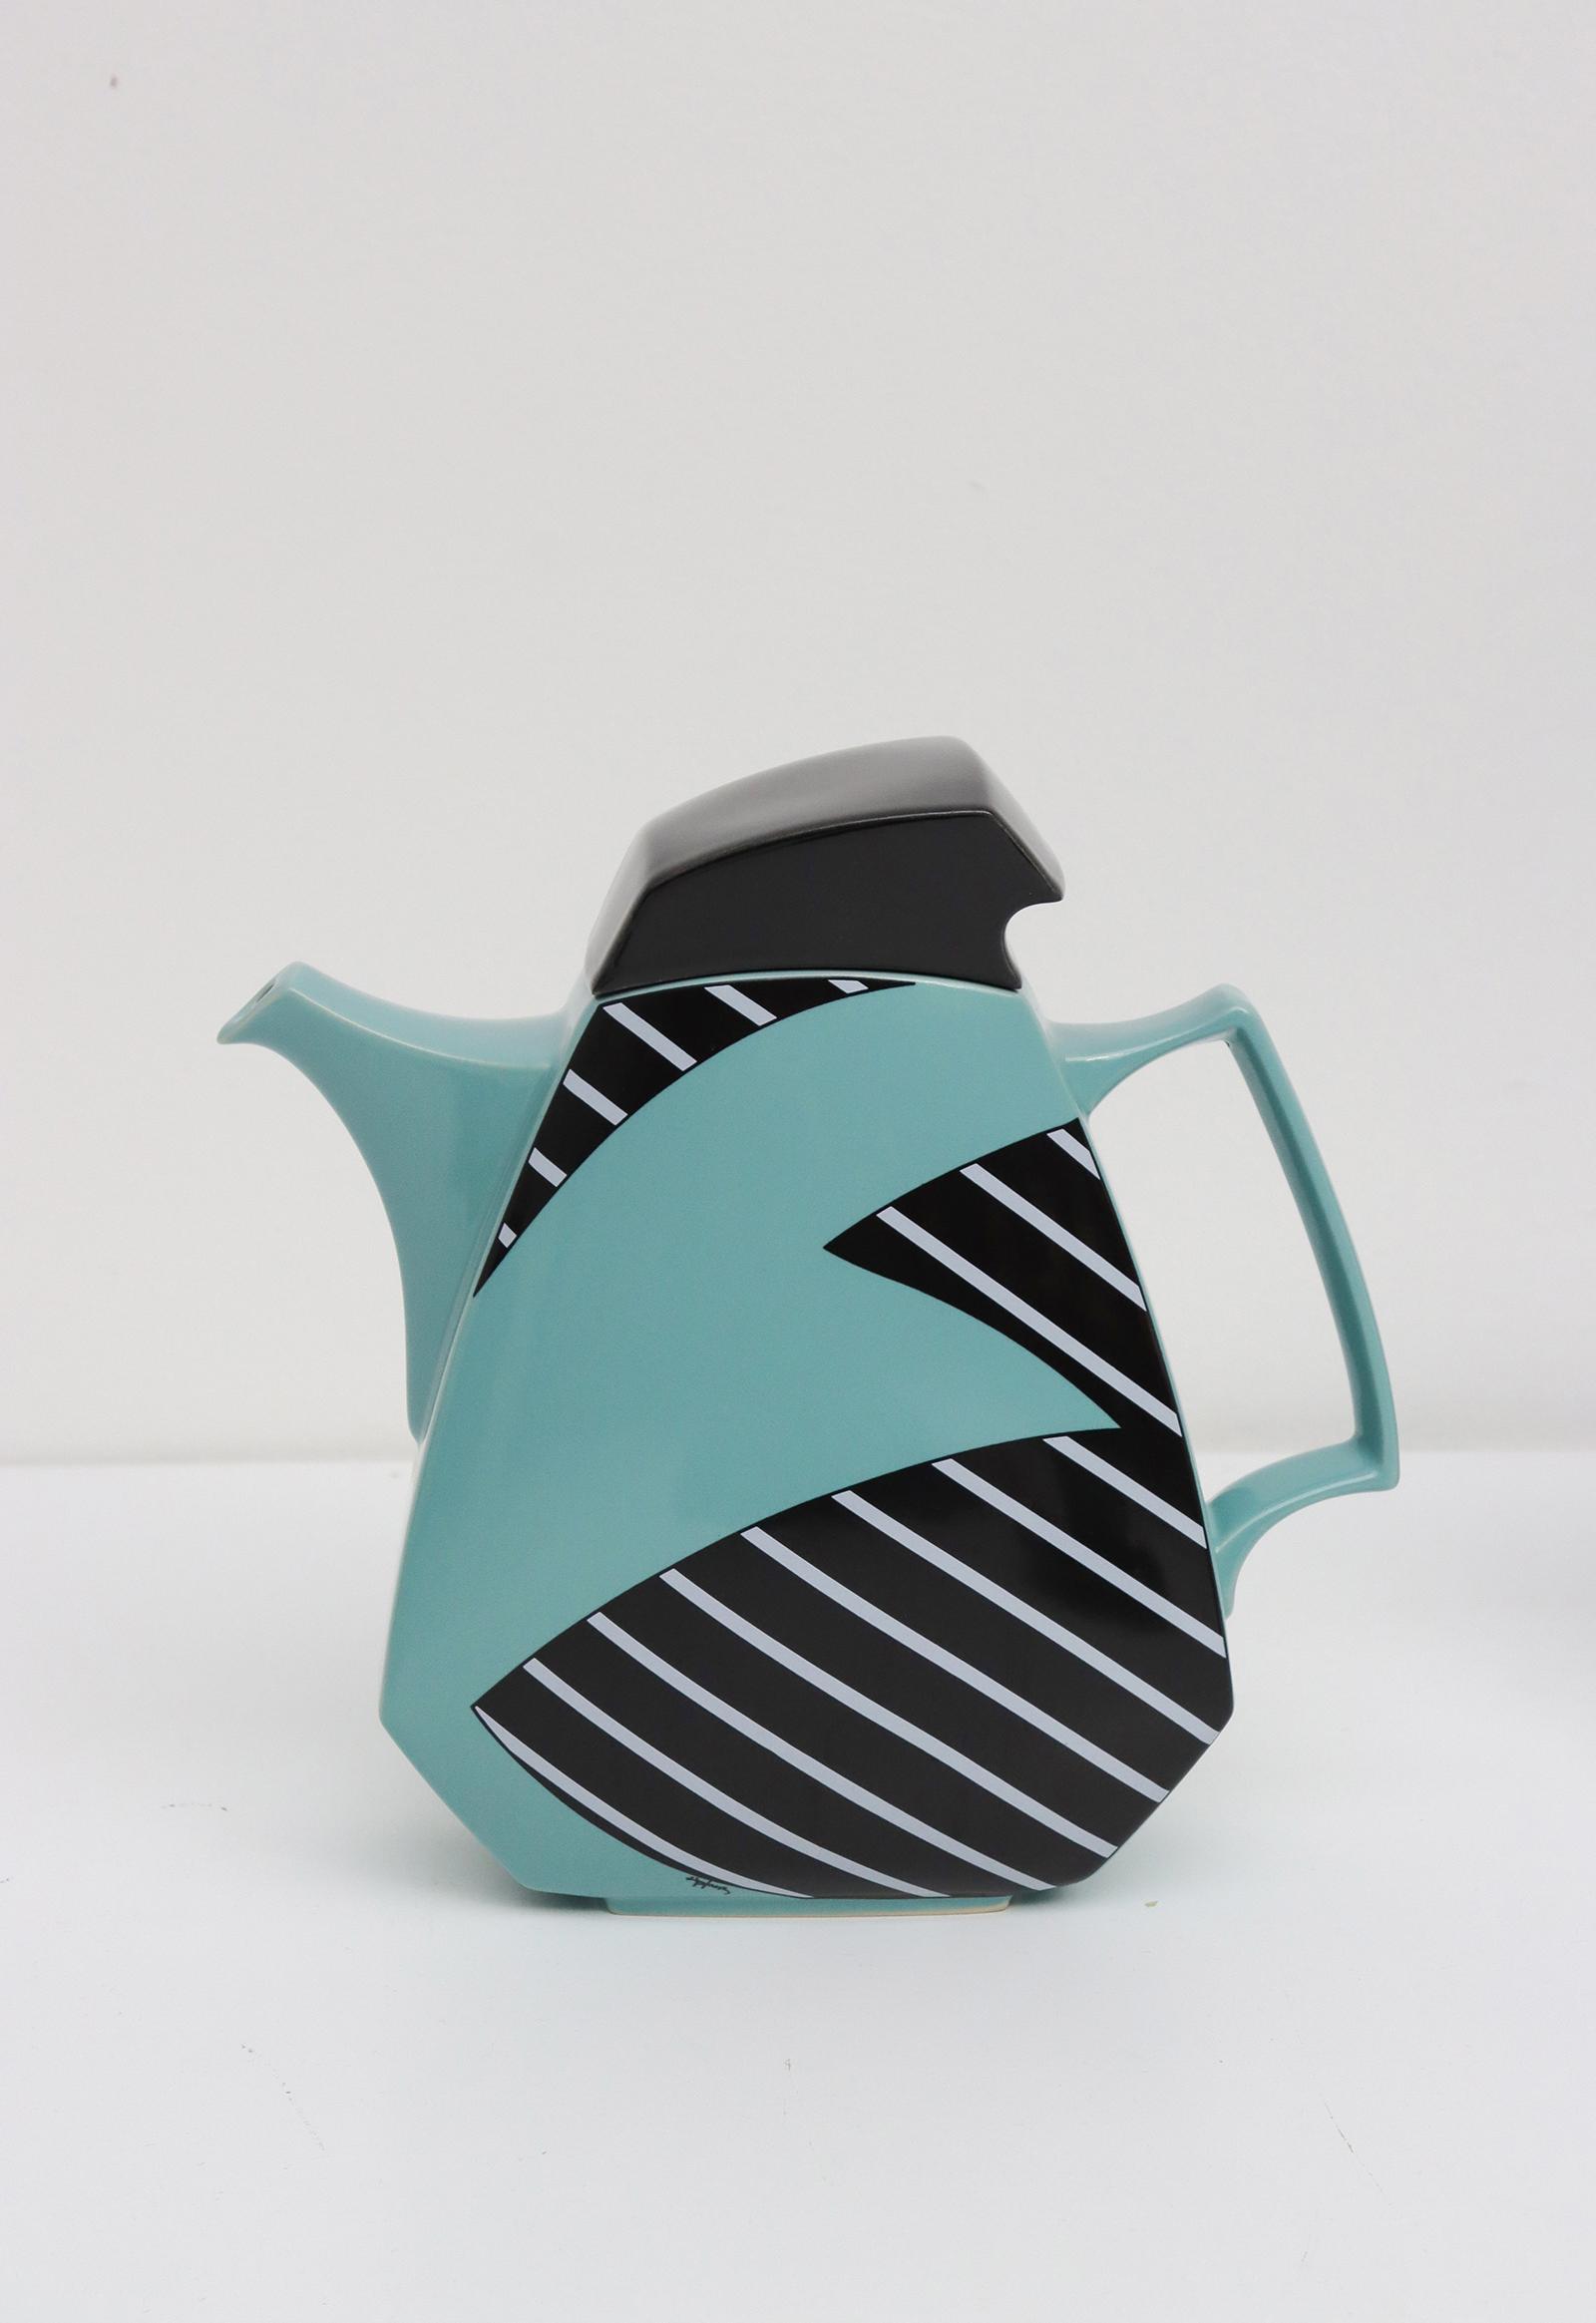 Flash Coffee and tea set by Dorothy Hafner for Rosenthalimage 3